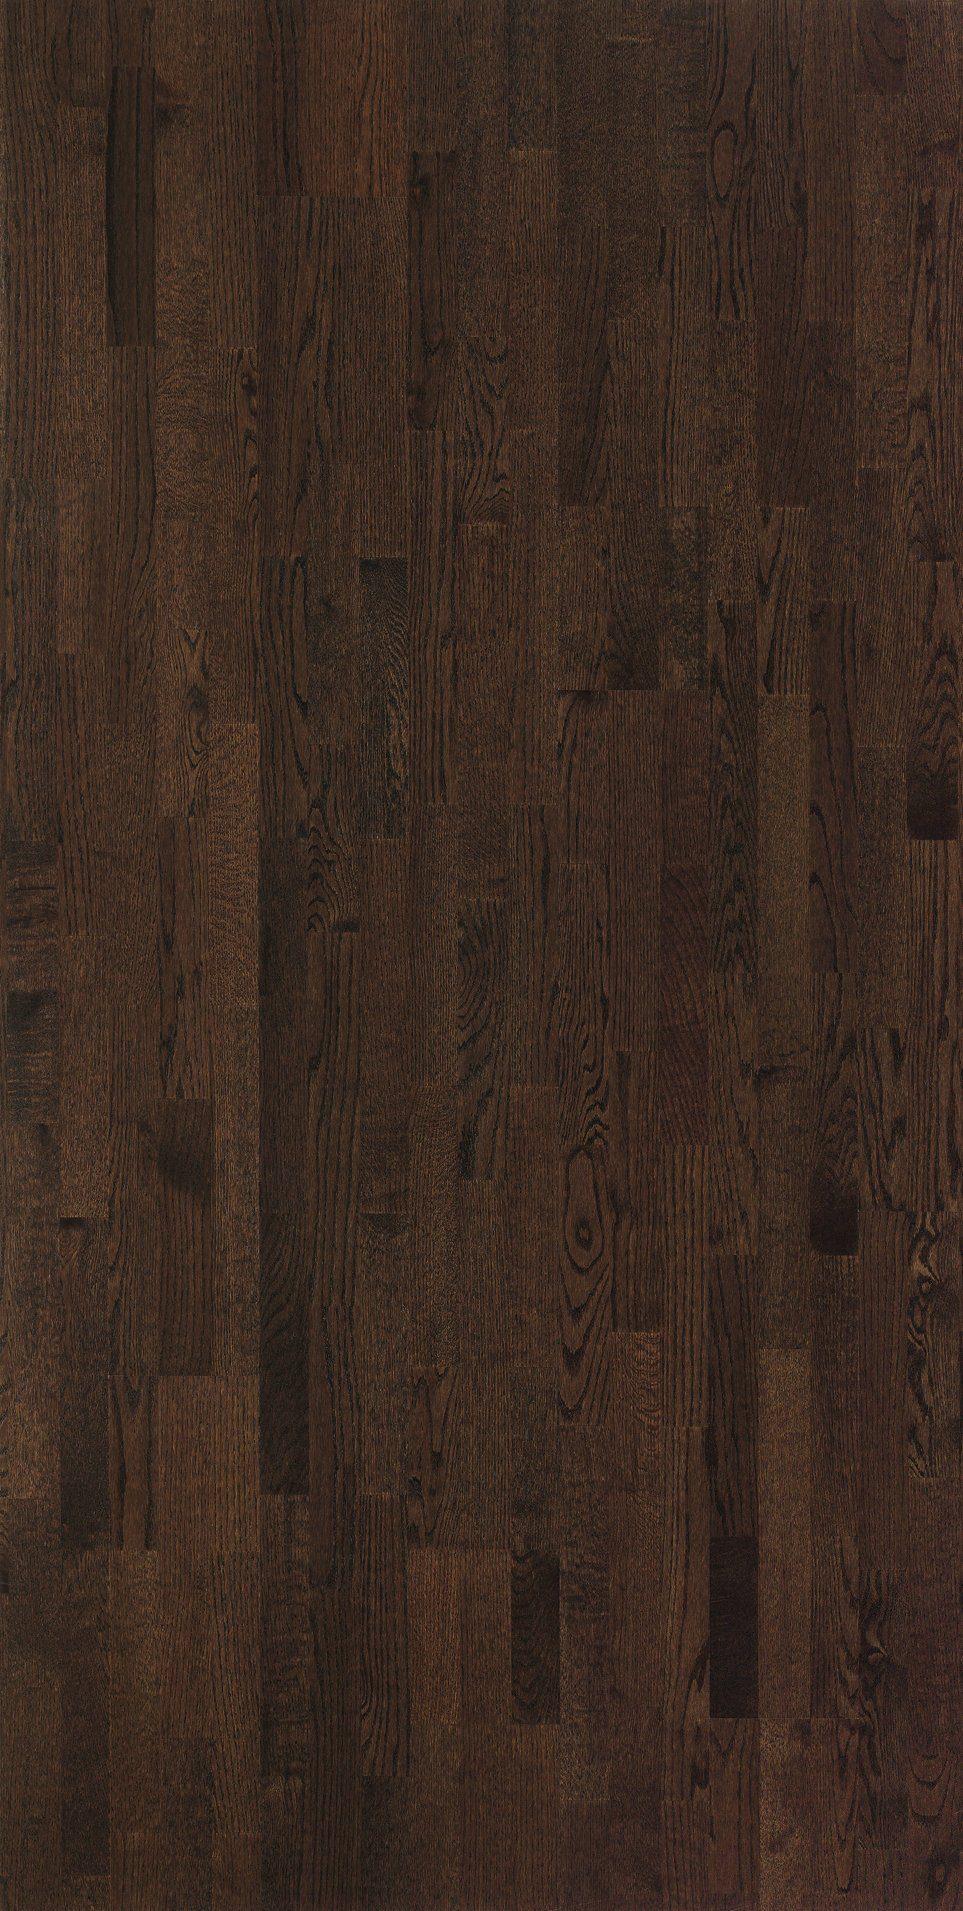 PARADOR Parkett »Basic Rustikal - Eiche Tabacco, lackiert«, 1080 x 185 mm, Stärke: 11,5 mm, 2,2 m²